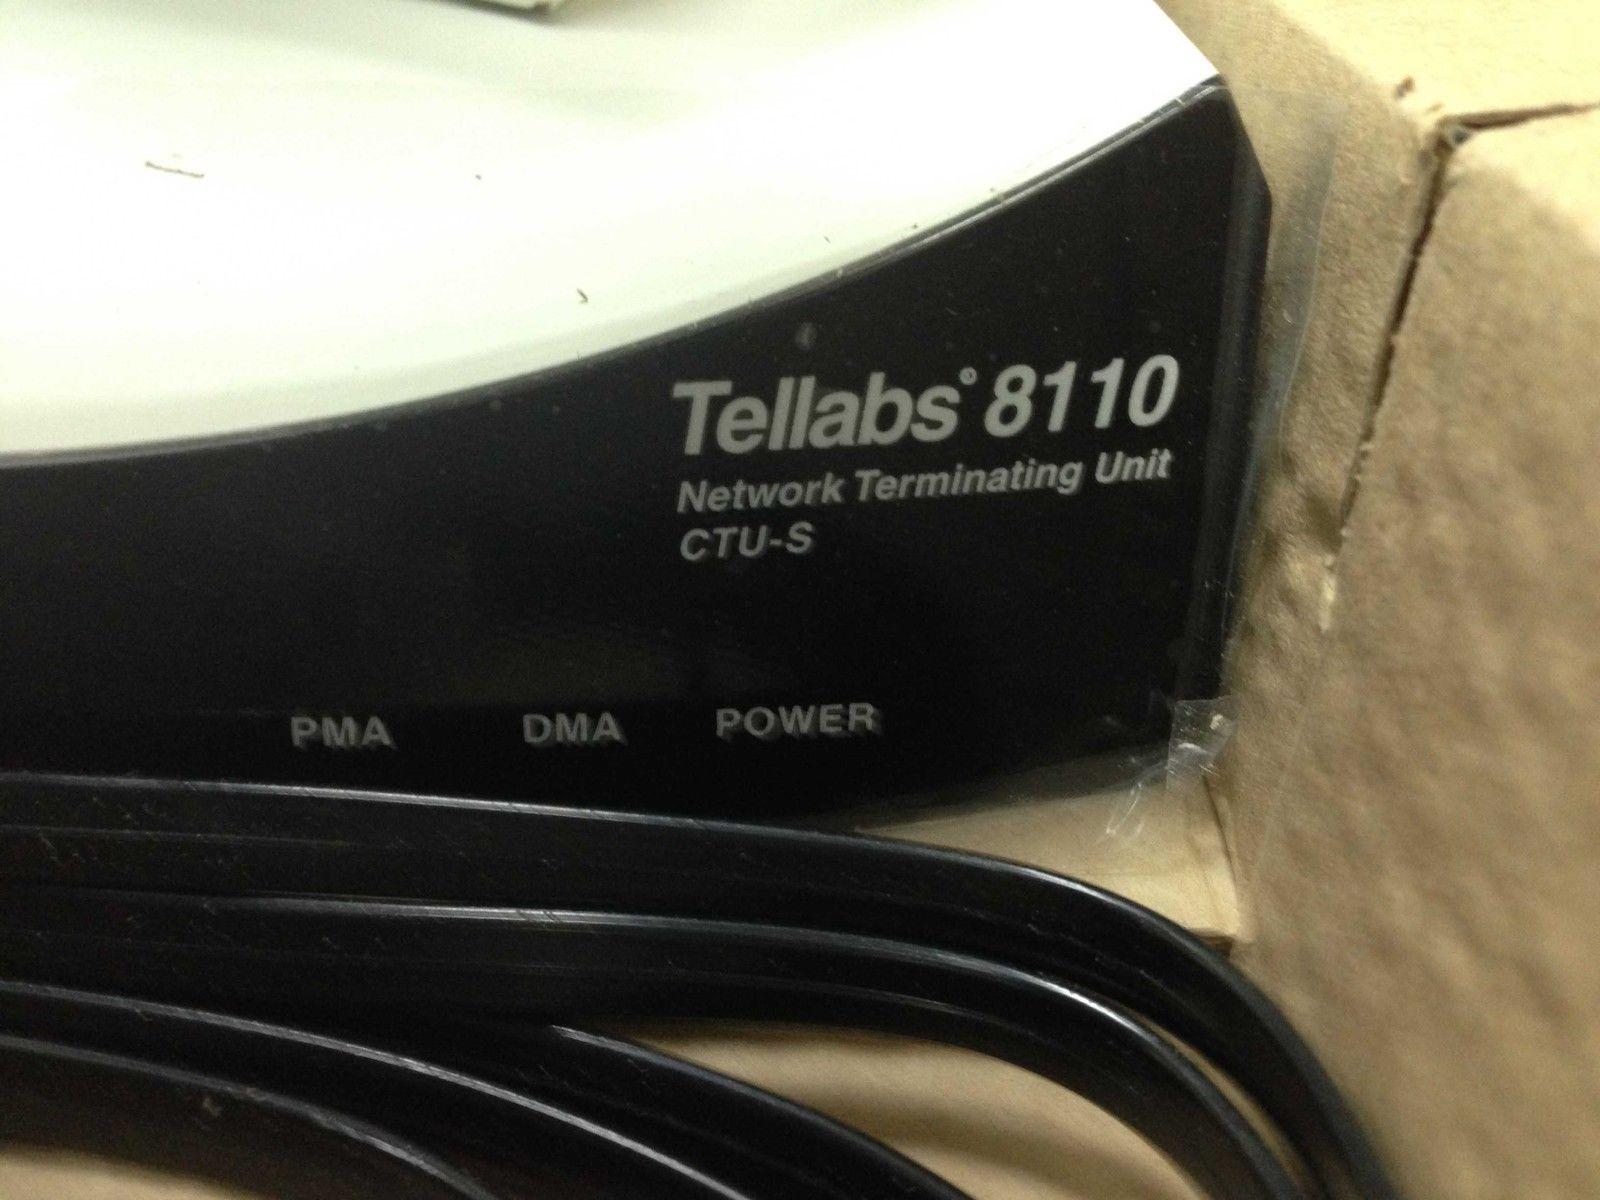 Lot of 10 pcs Tellabs 8110 Network Termination Units CTU-S G.703_4